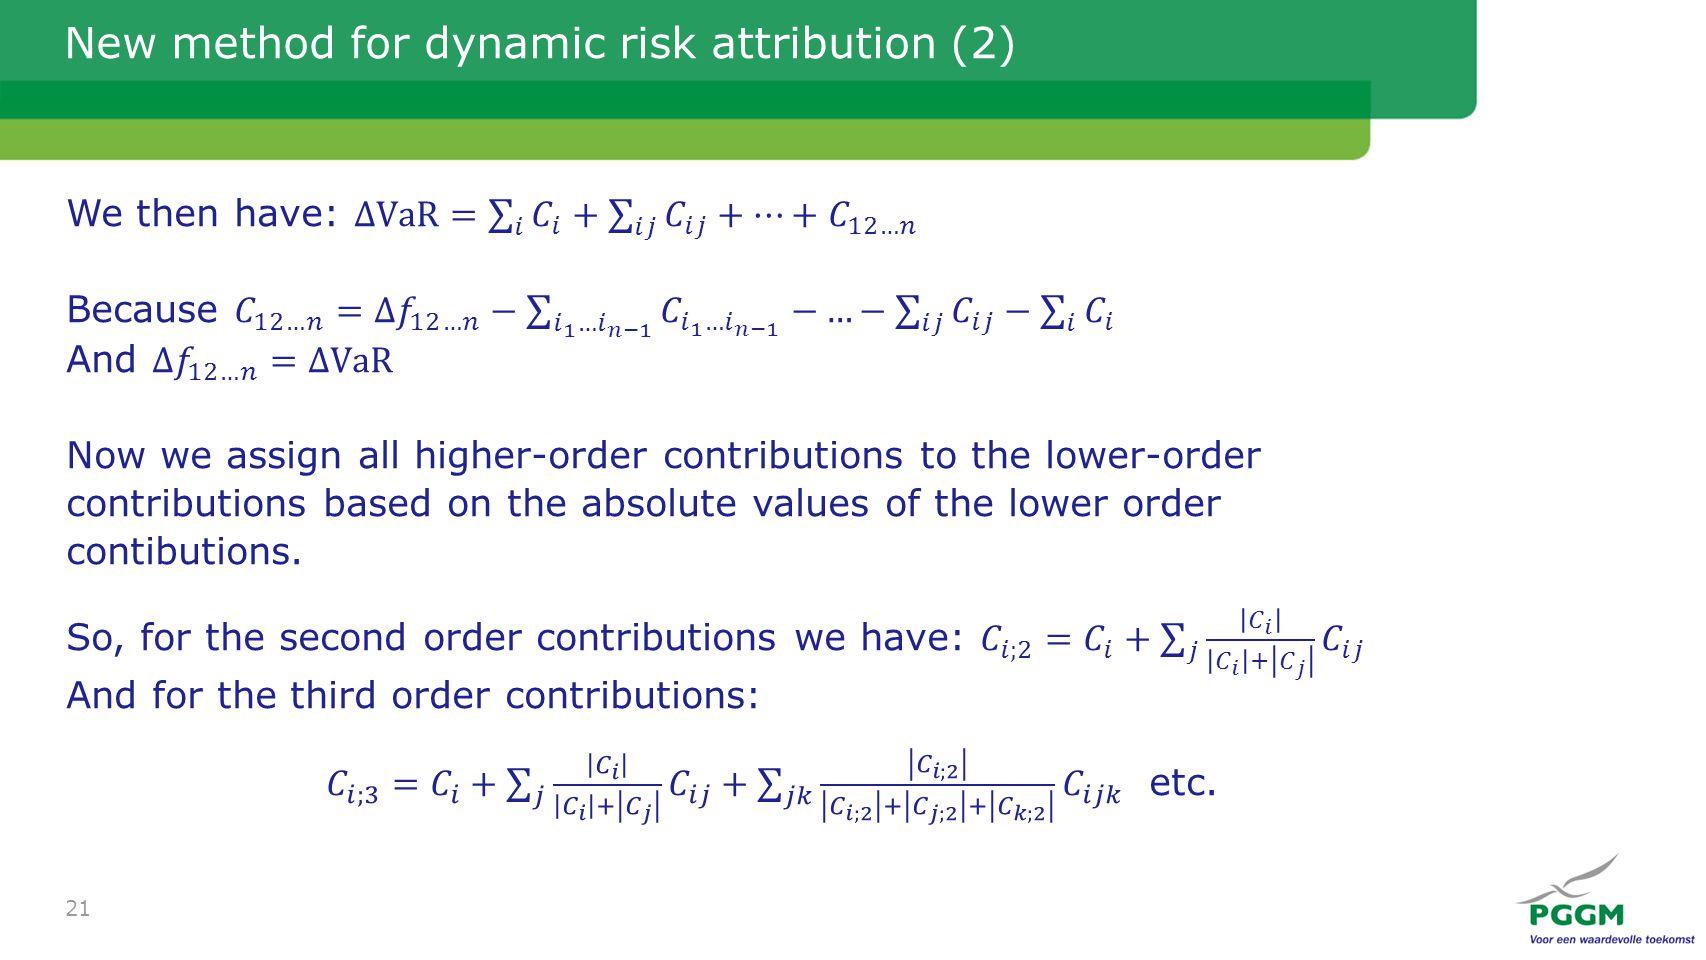 New method for dynamic risk attribution (2) 21